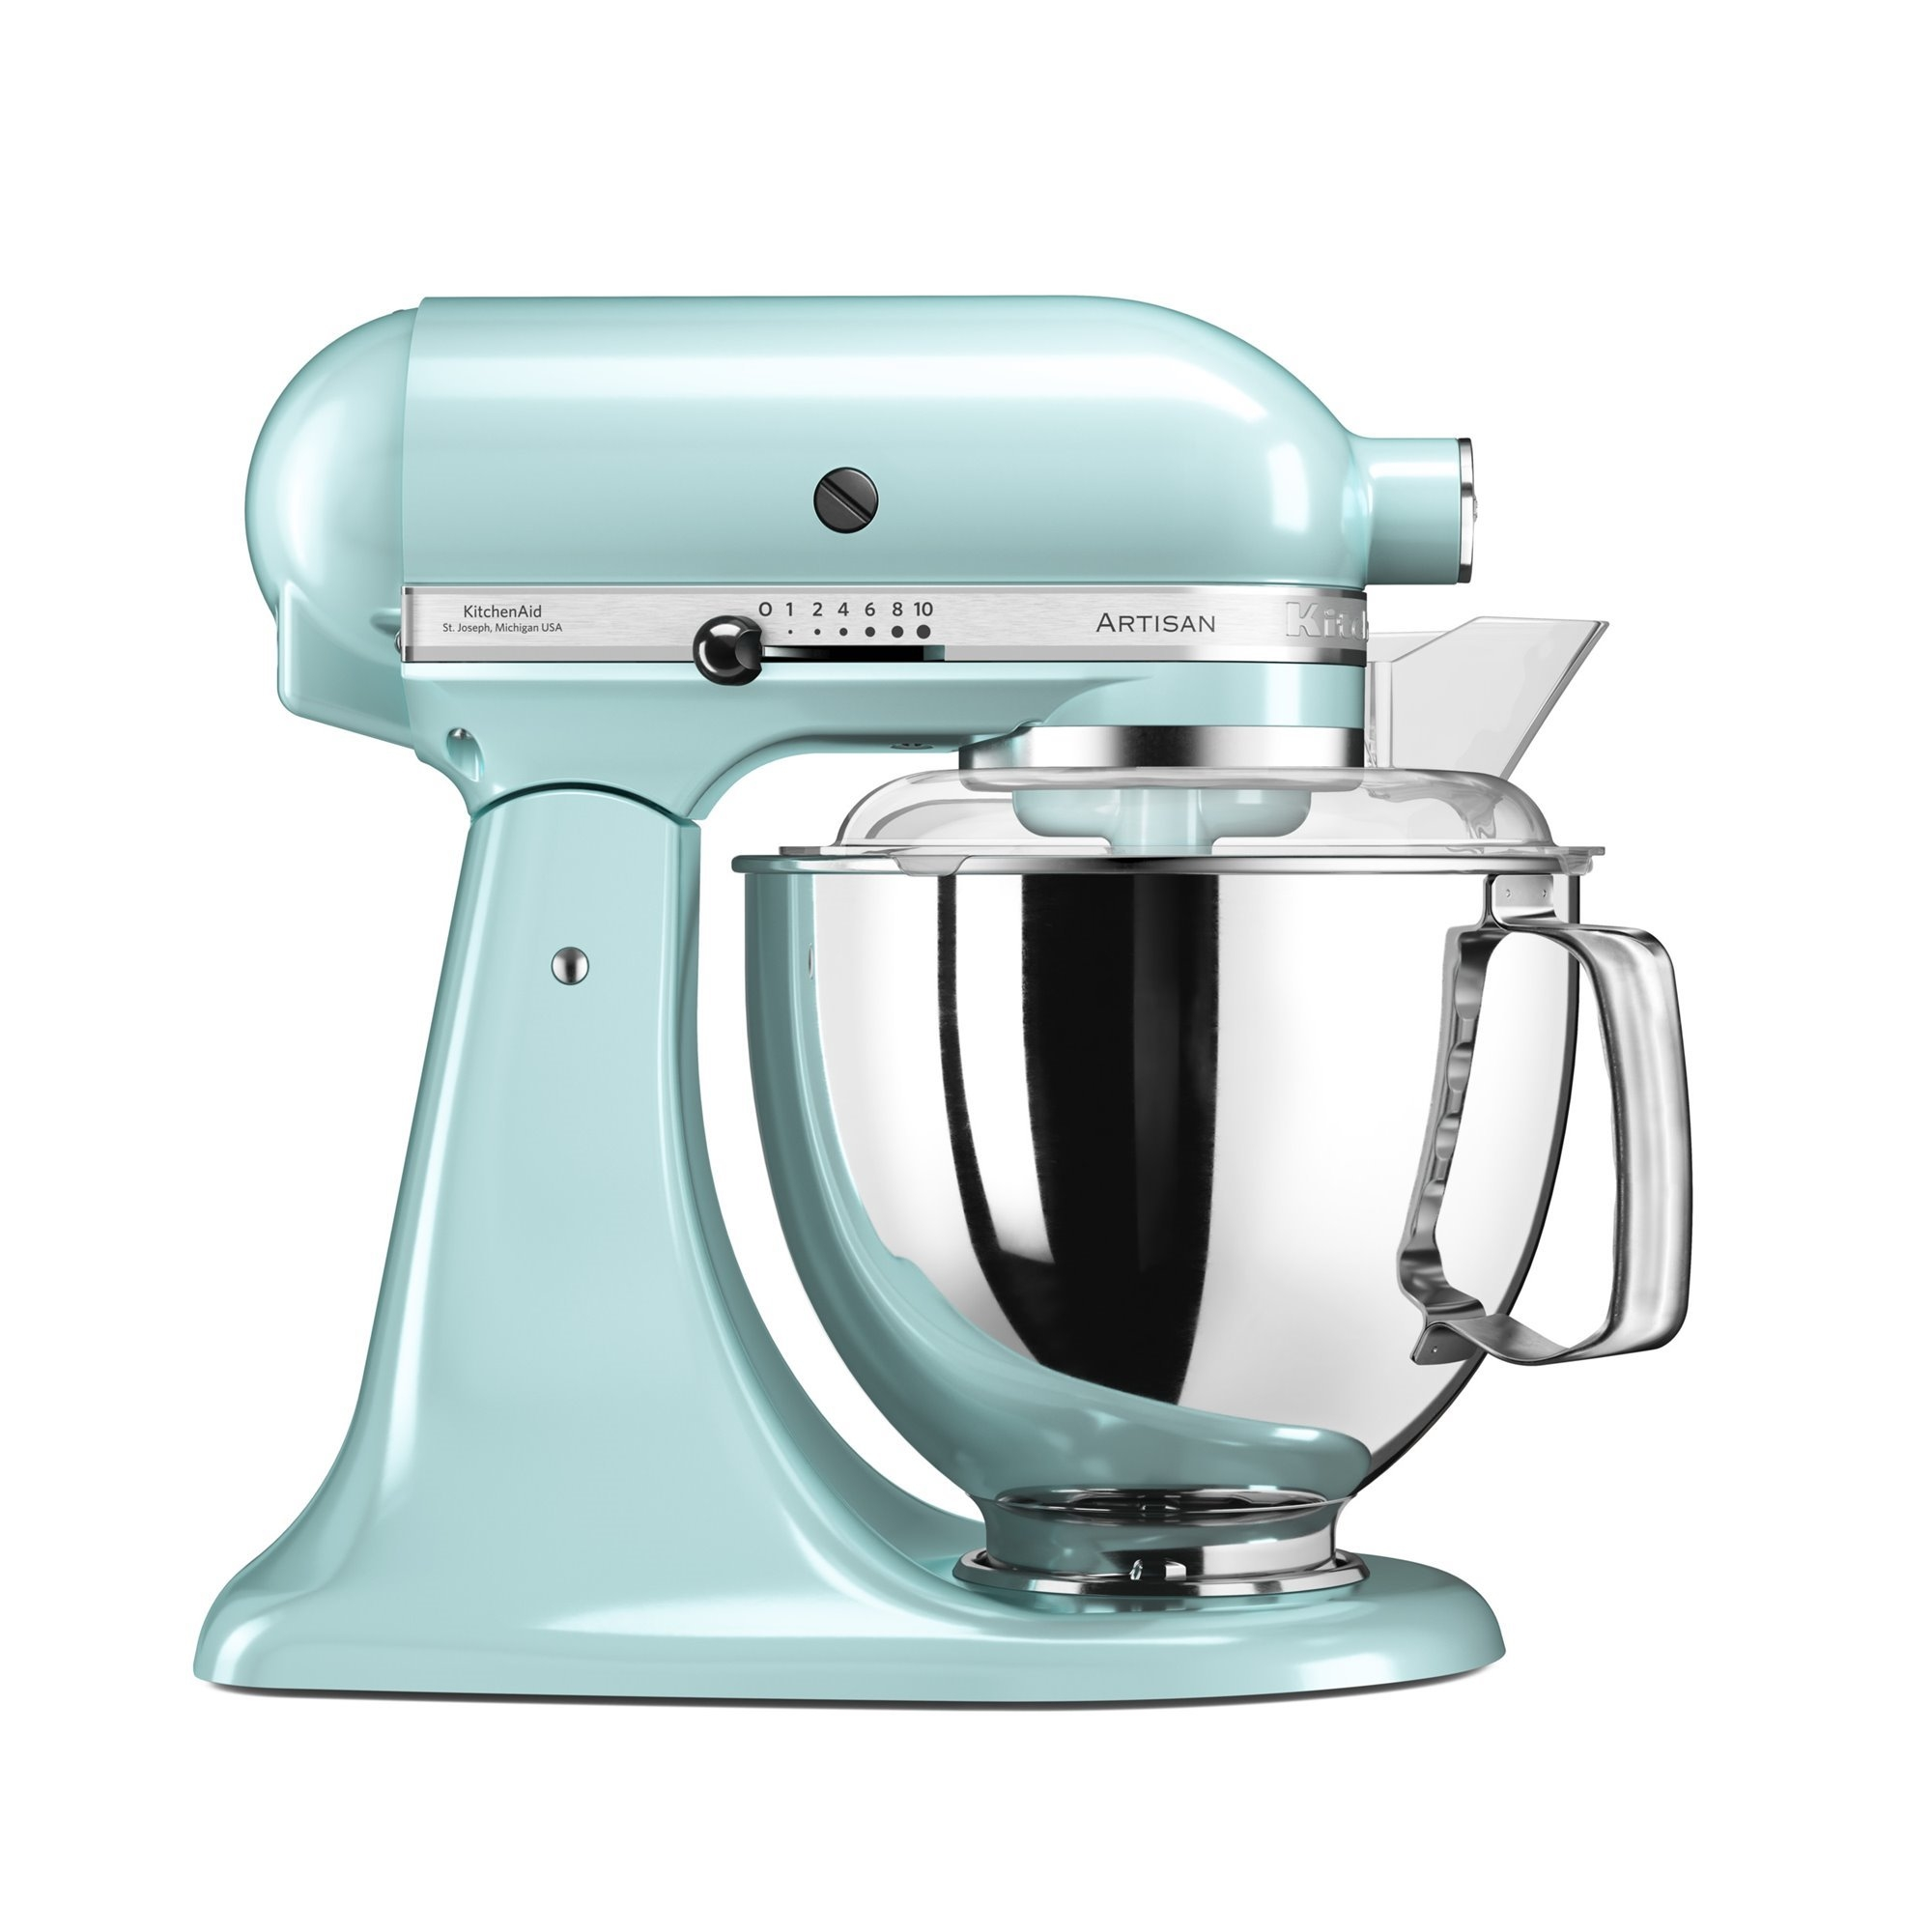 Mixer cu bol Artisan Elegance 5KSM175PSEIC 48 L Ice Blue 300W KitchenAid